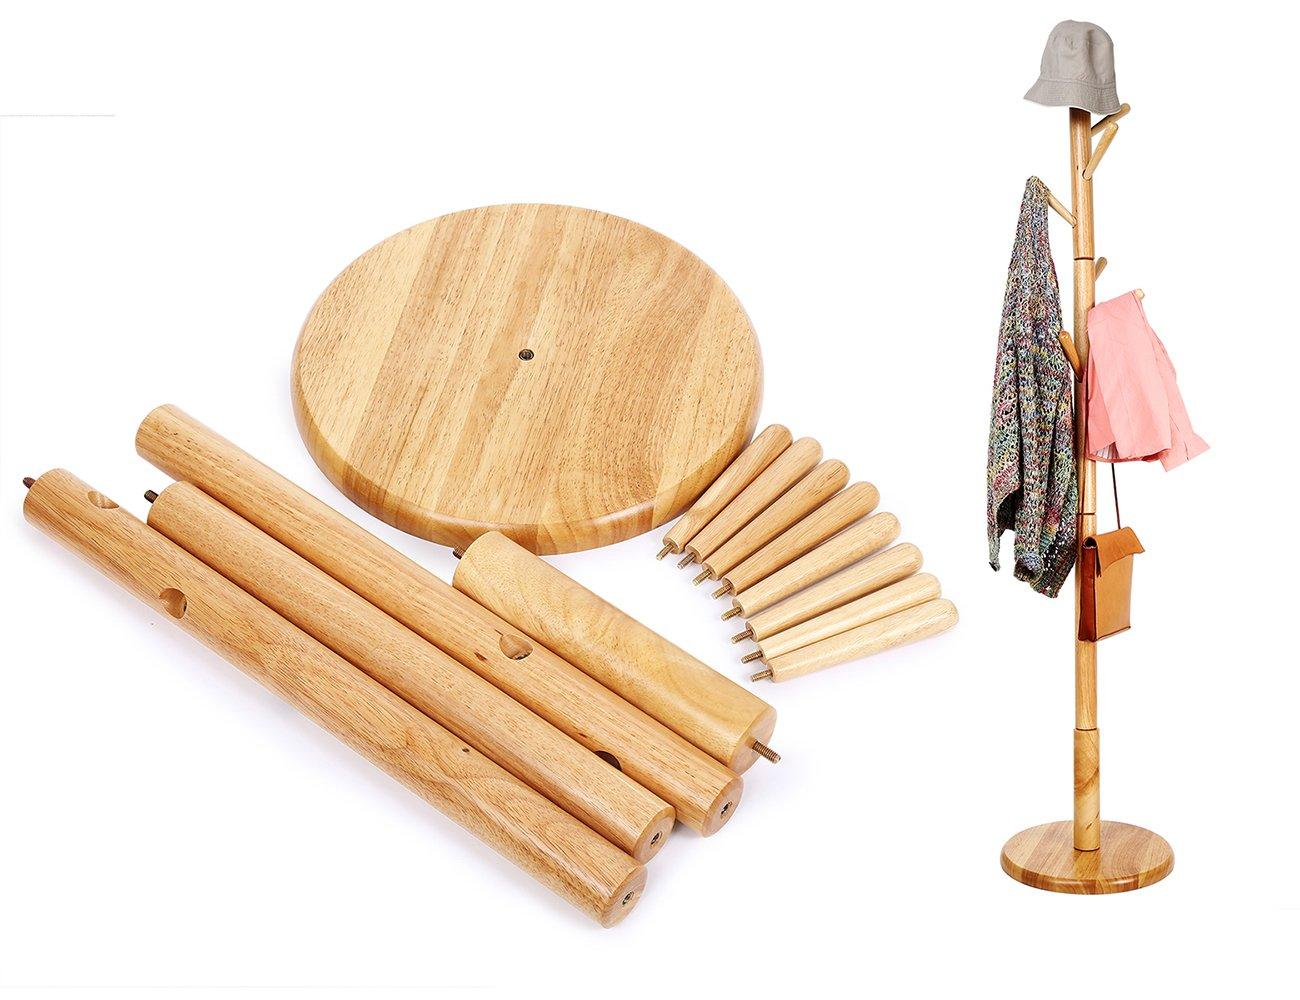 BESTOOL Coat Rack-Wooden Standing Clothes Rack Solid Wood Entryway Free Tree Floor Stand, Jacket Purse Bag and Hat Holder Rack-8 Hooks